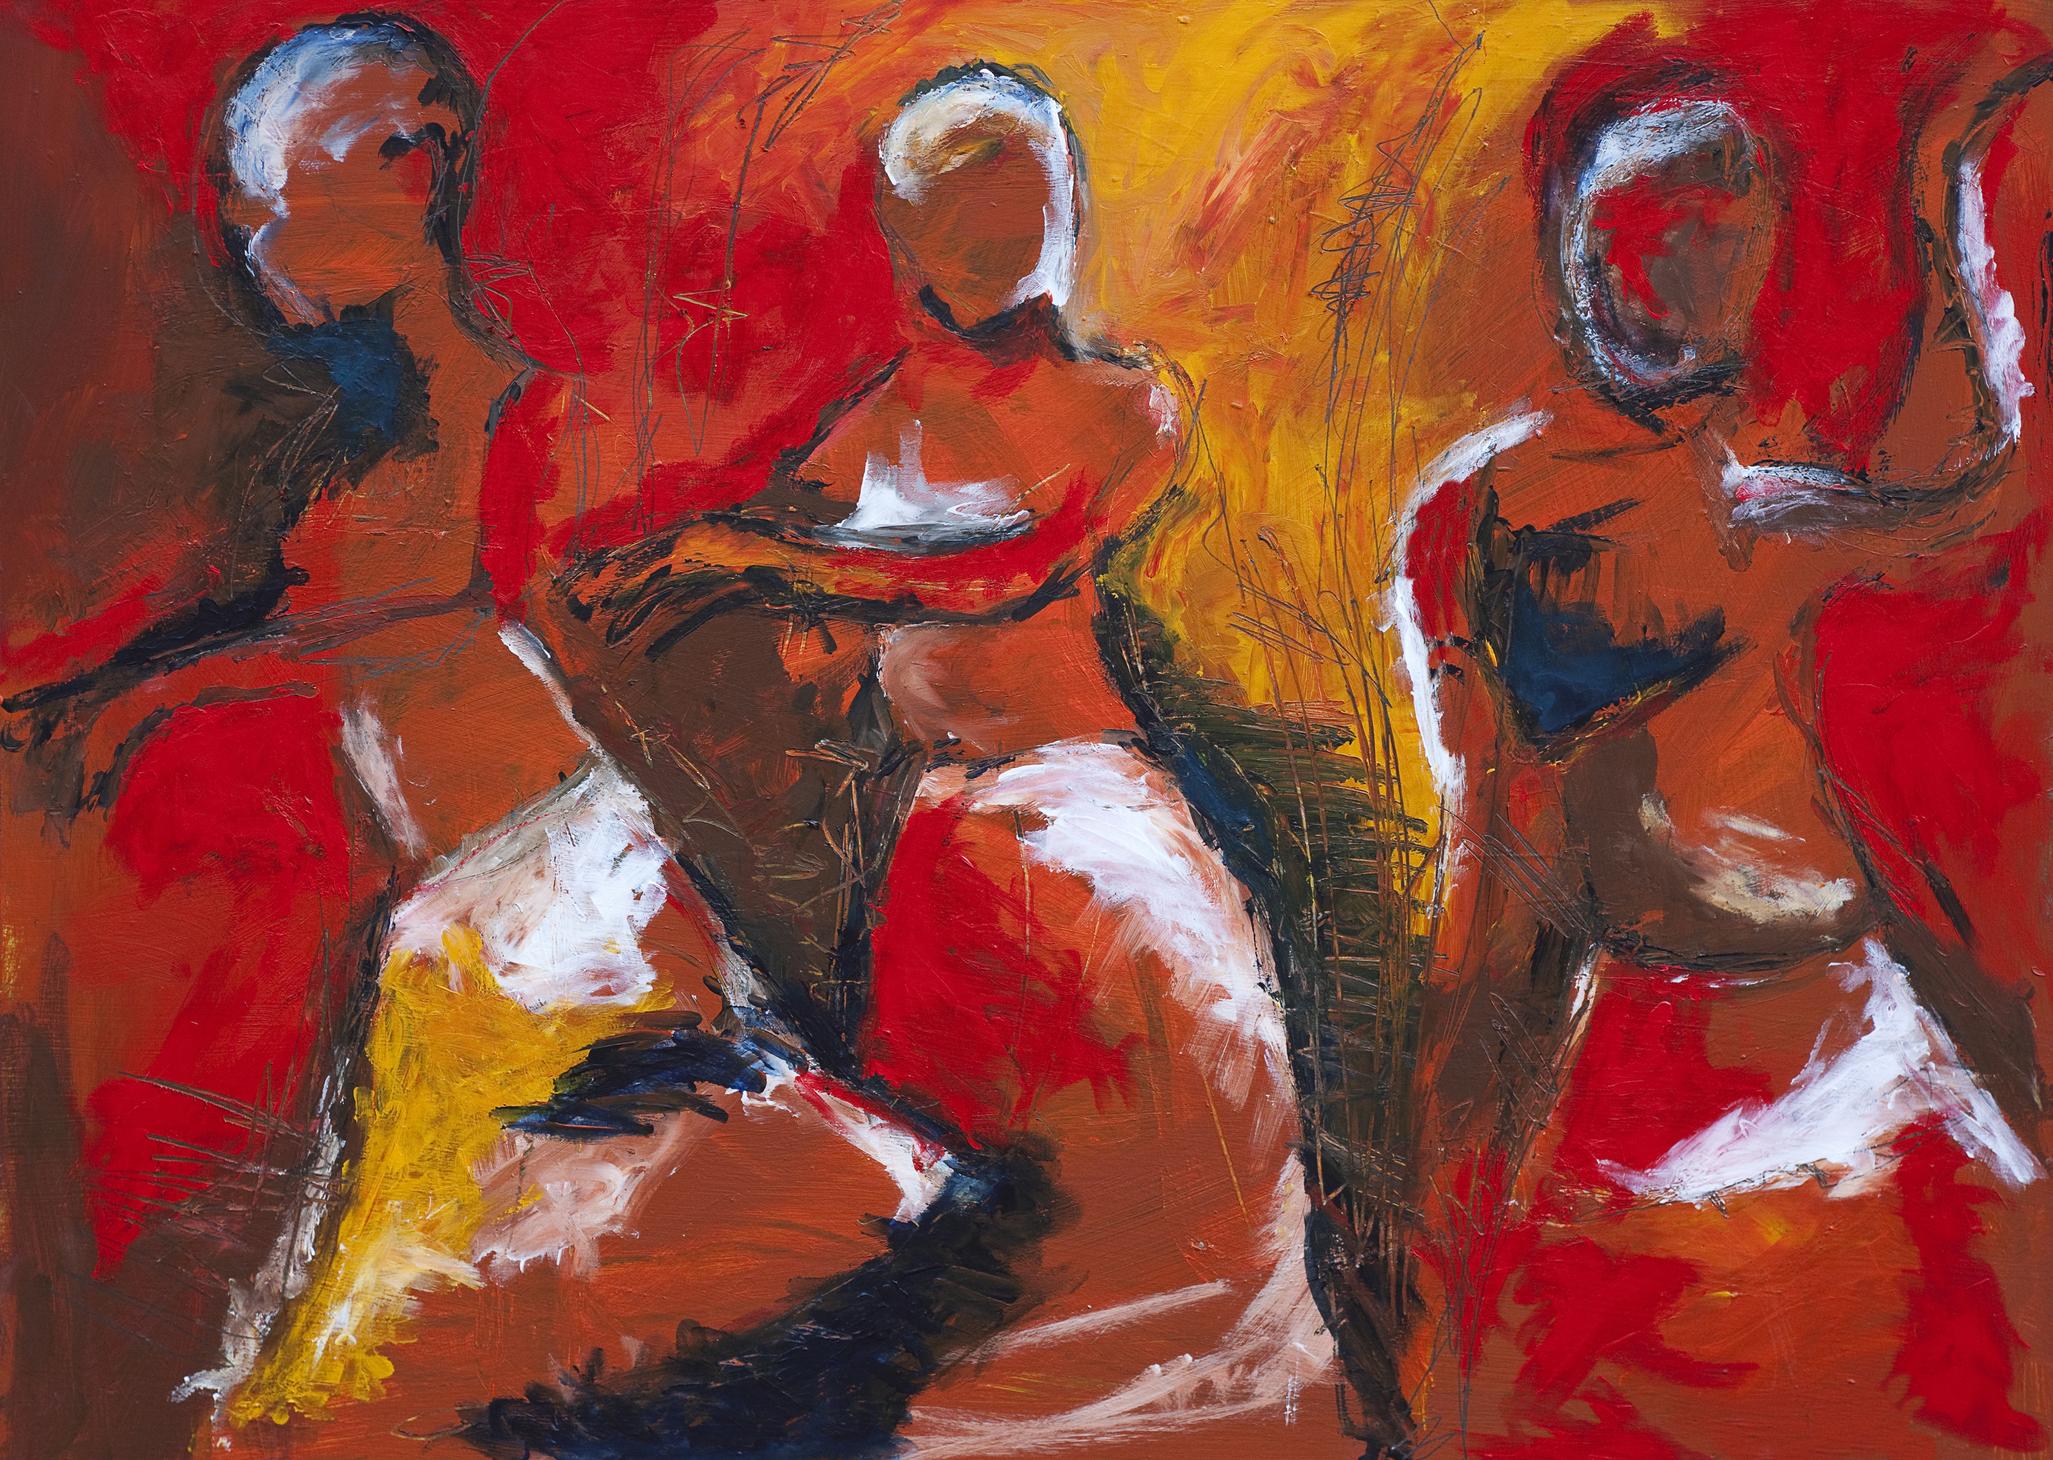 Image: iStock© Claudiad - African dancers